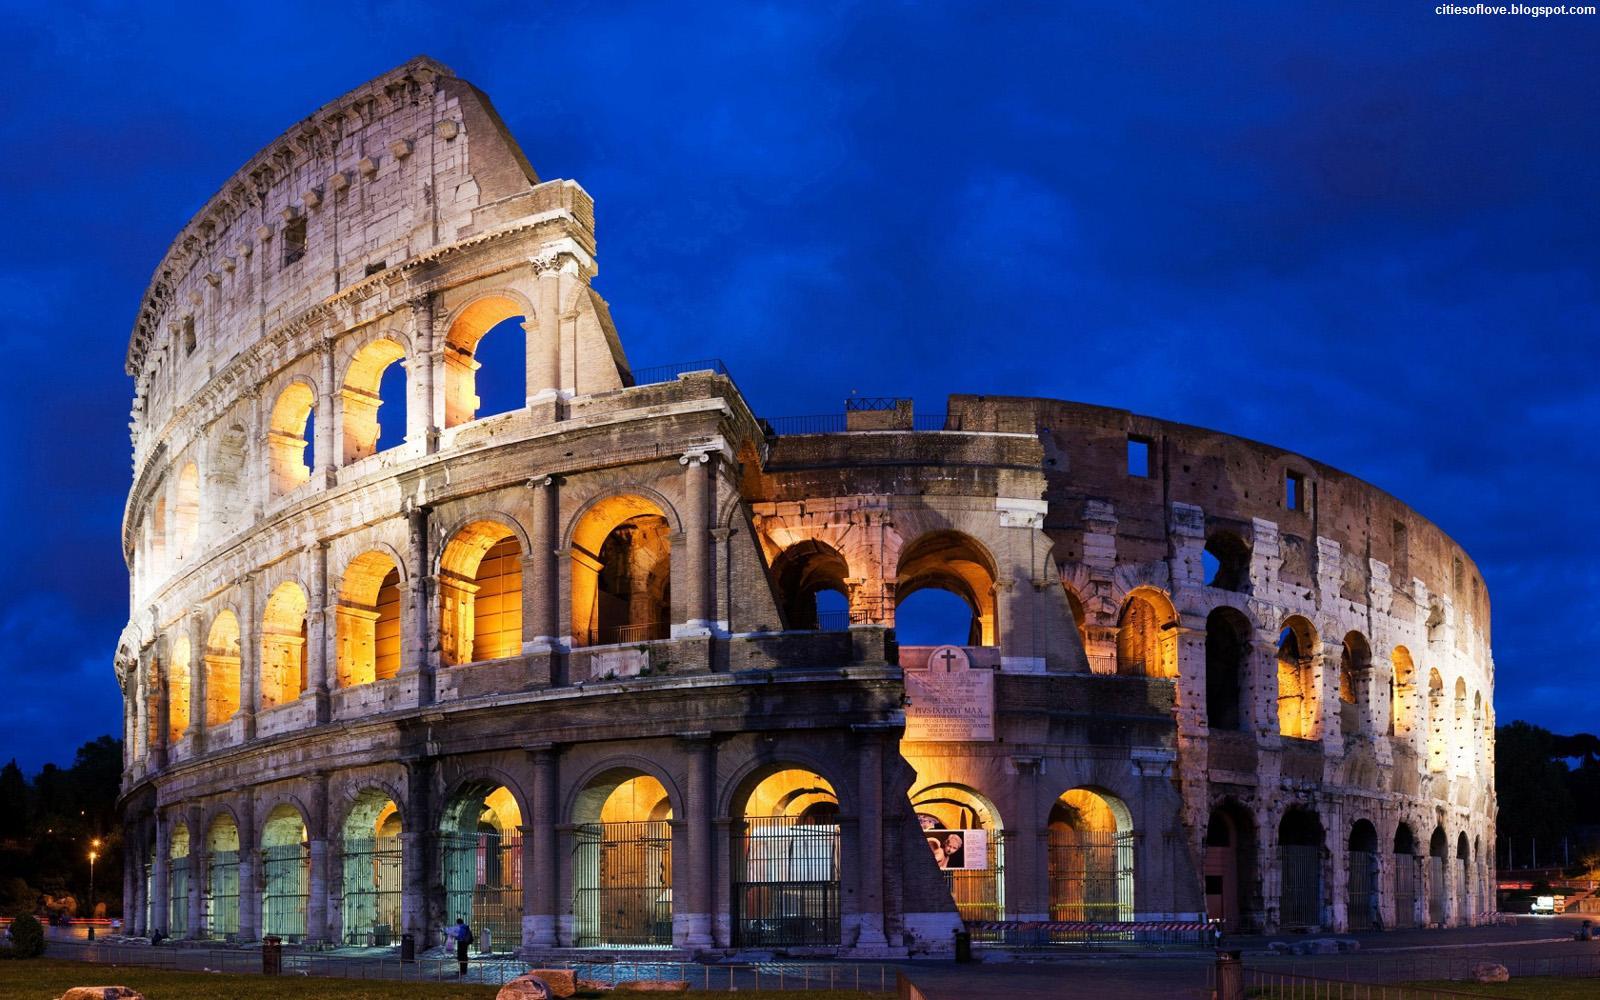 http://1.bp.blogspot.com/-RoPjv07h2uc/UJpZJCJ8XfI/AAAAAAAAIUM/hBqgsybupeI/s1600/Rome_Colosseum_Romanum_Beautiful_Special_Italian_Capital_City_Italy_Hd_Desktop_Wallpaper_citiesoflove.blogspot.com.jpg